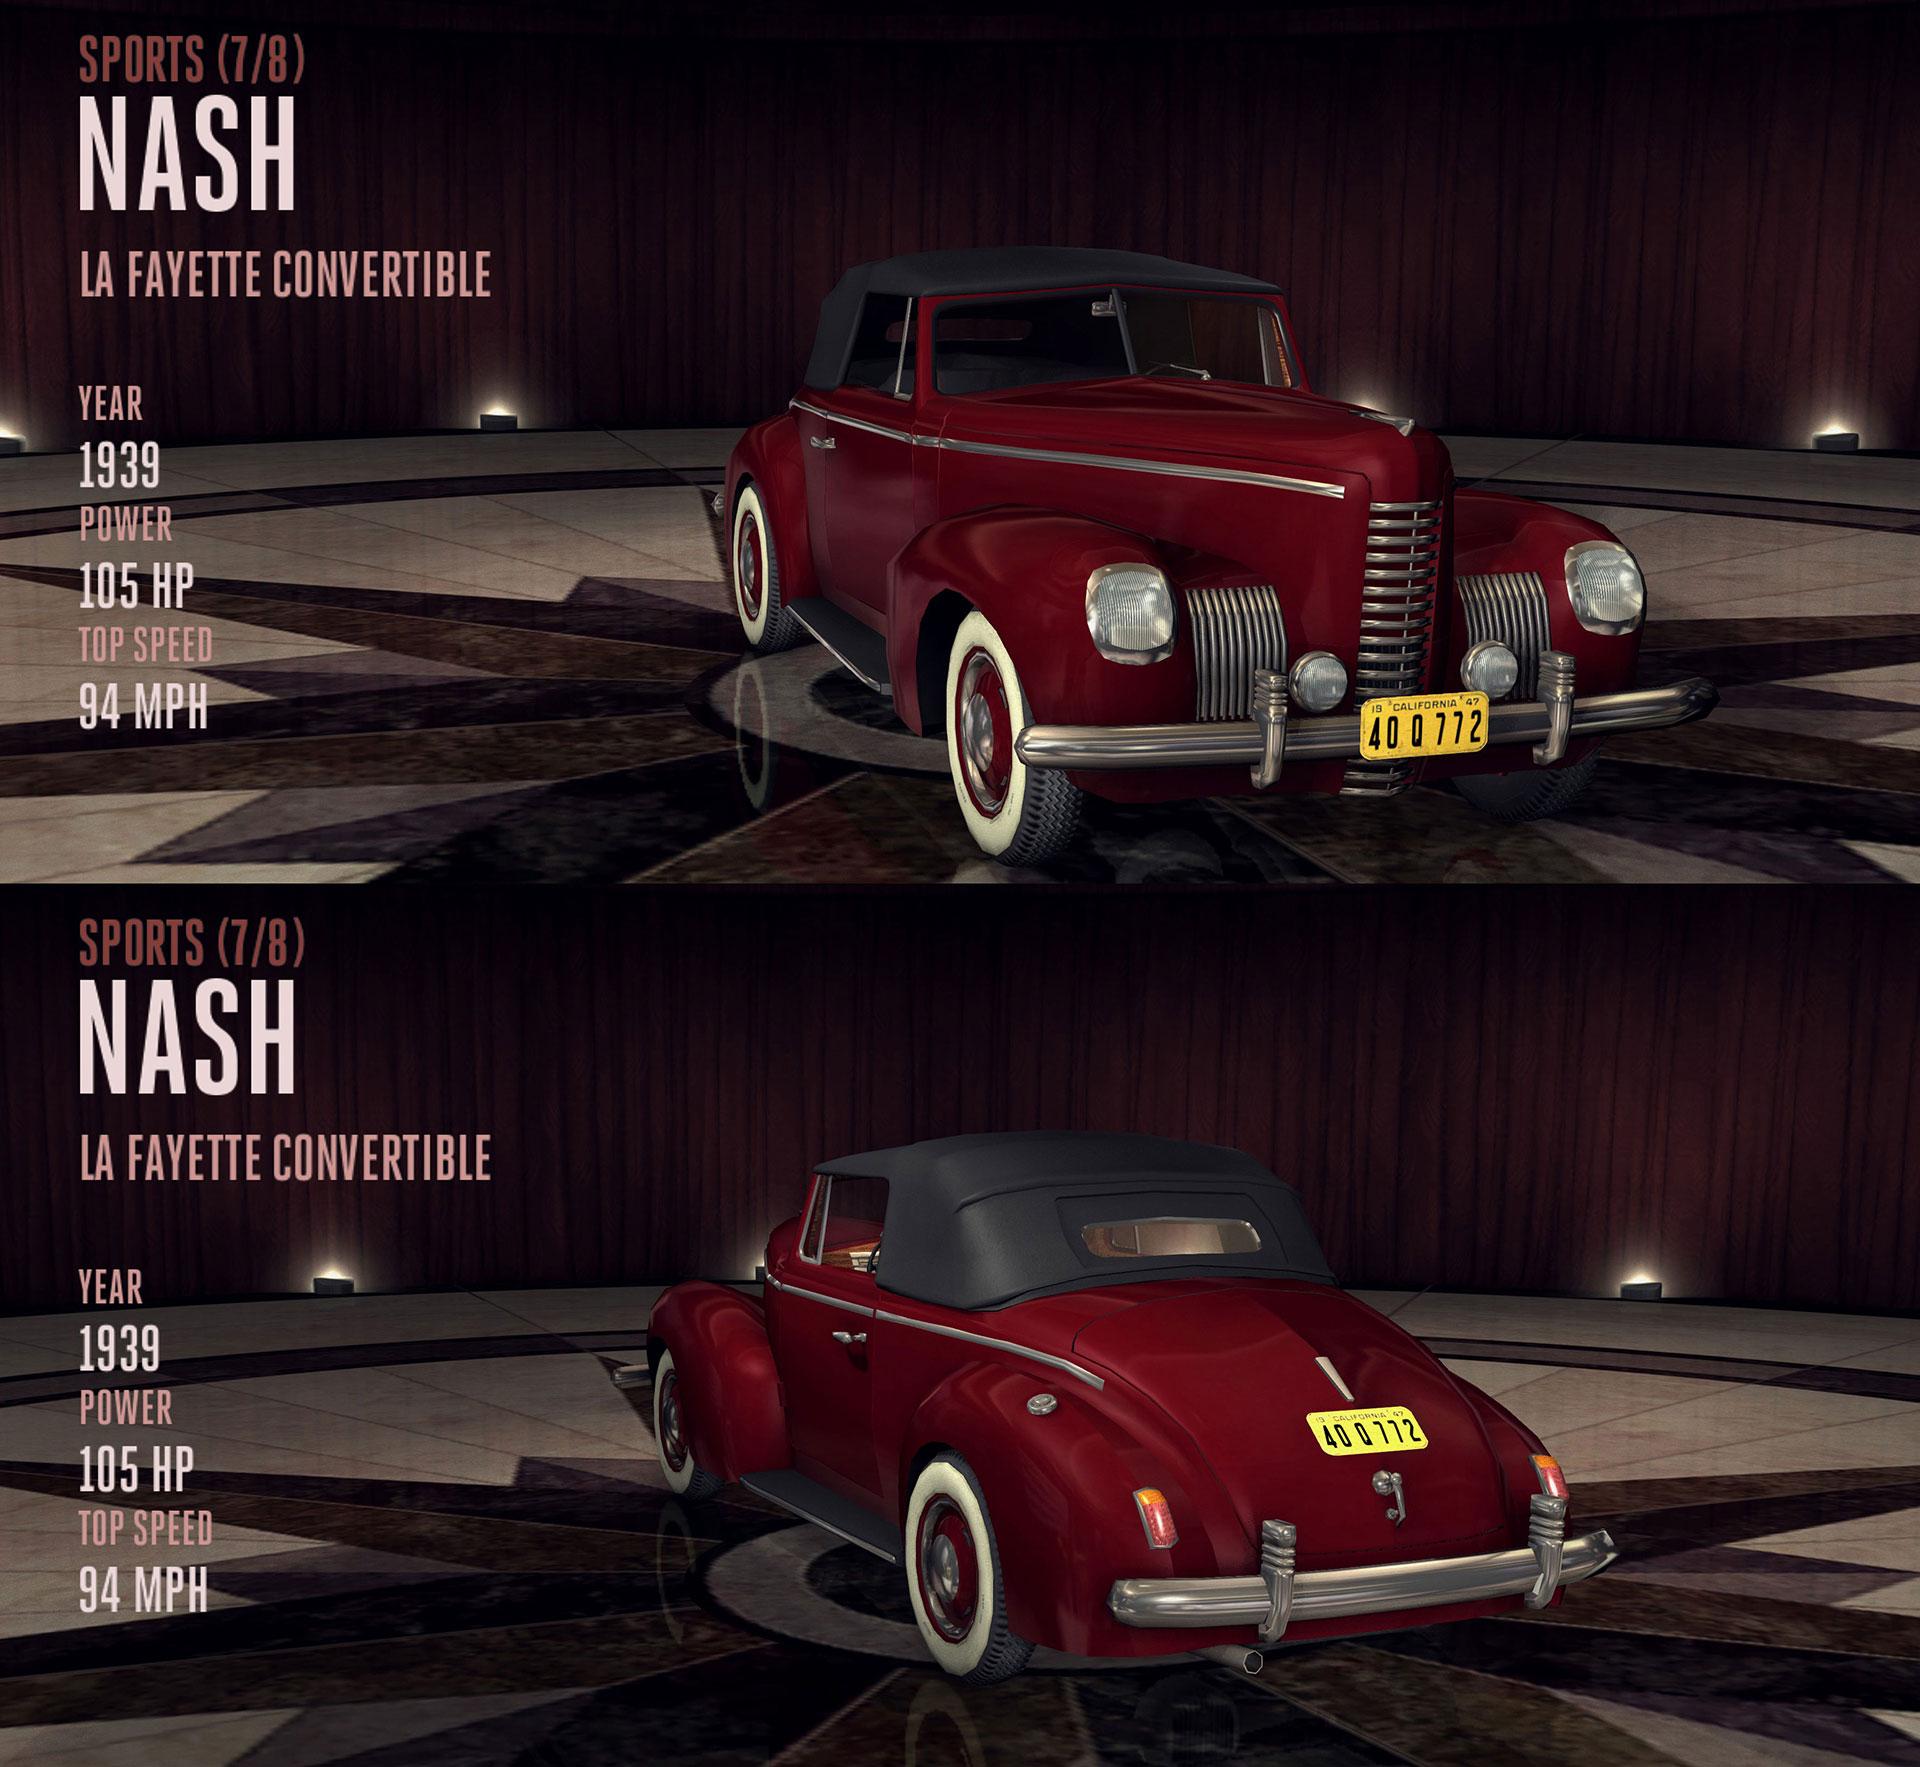 File:1939-nash-la-fayette-convertible.jpg